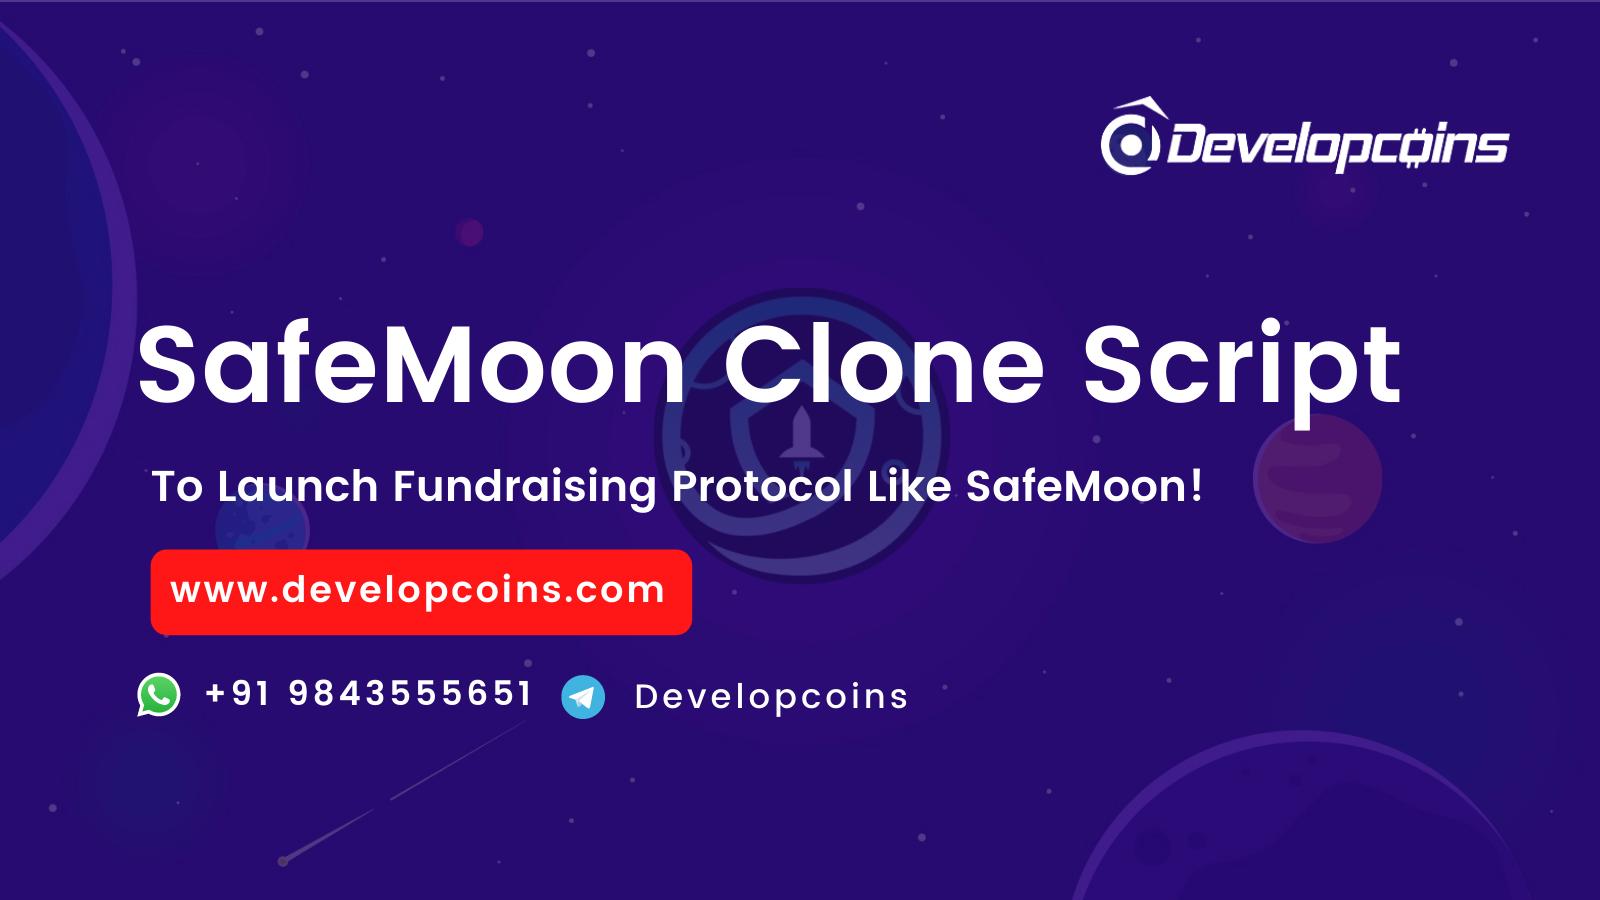 Create A DeFi based Fundraising Protocol like SafeMoon